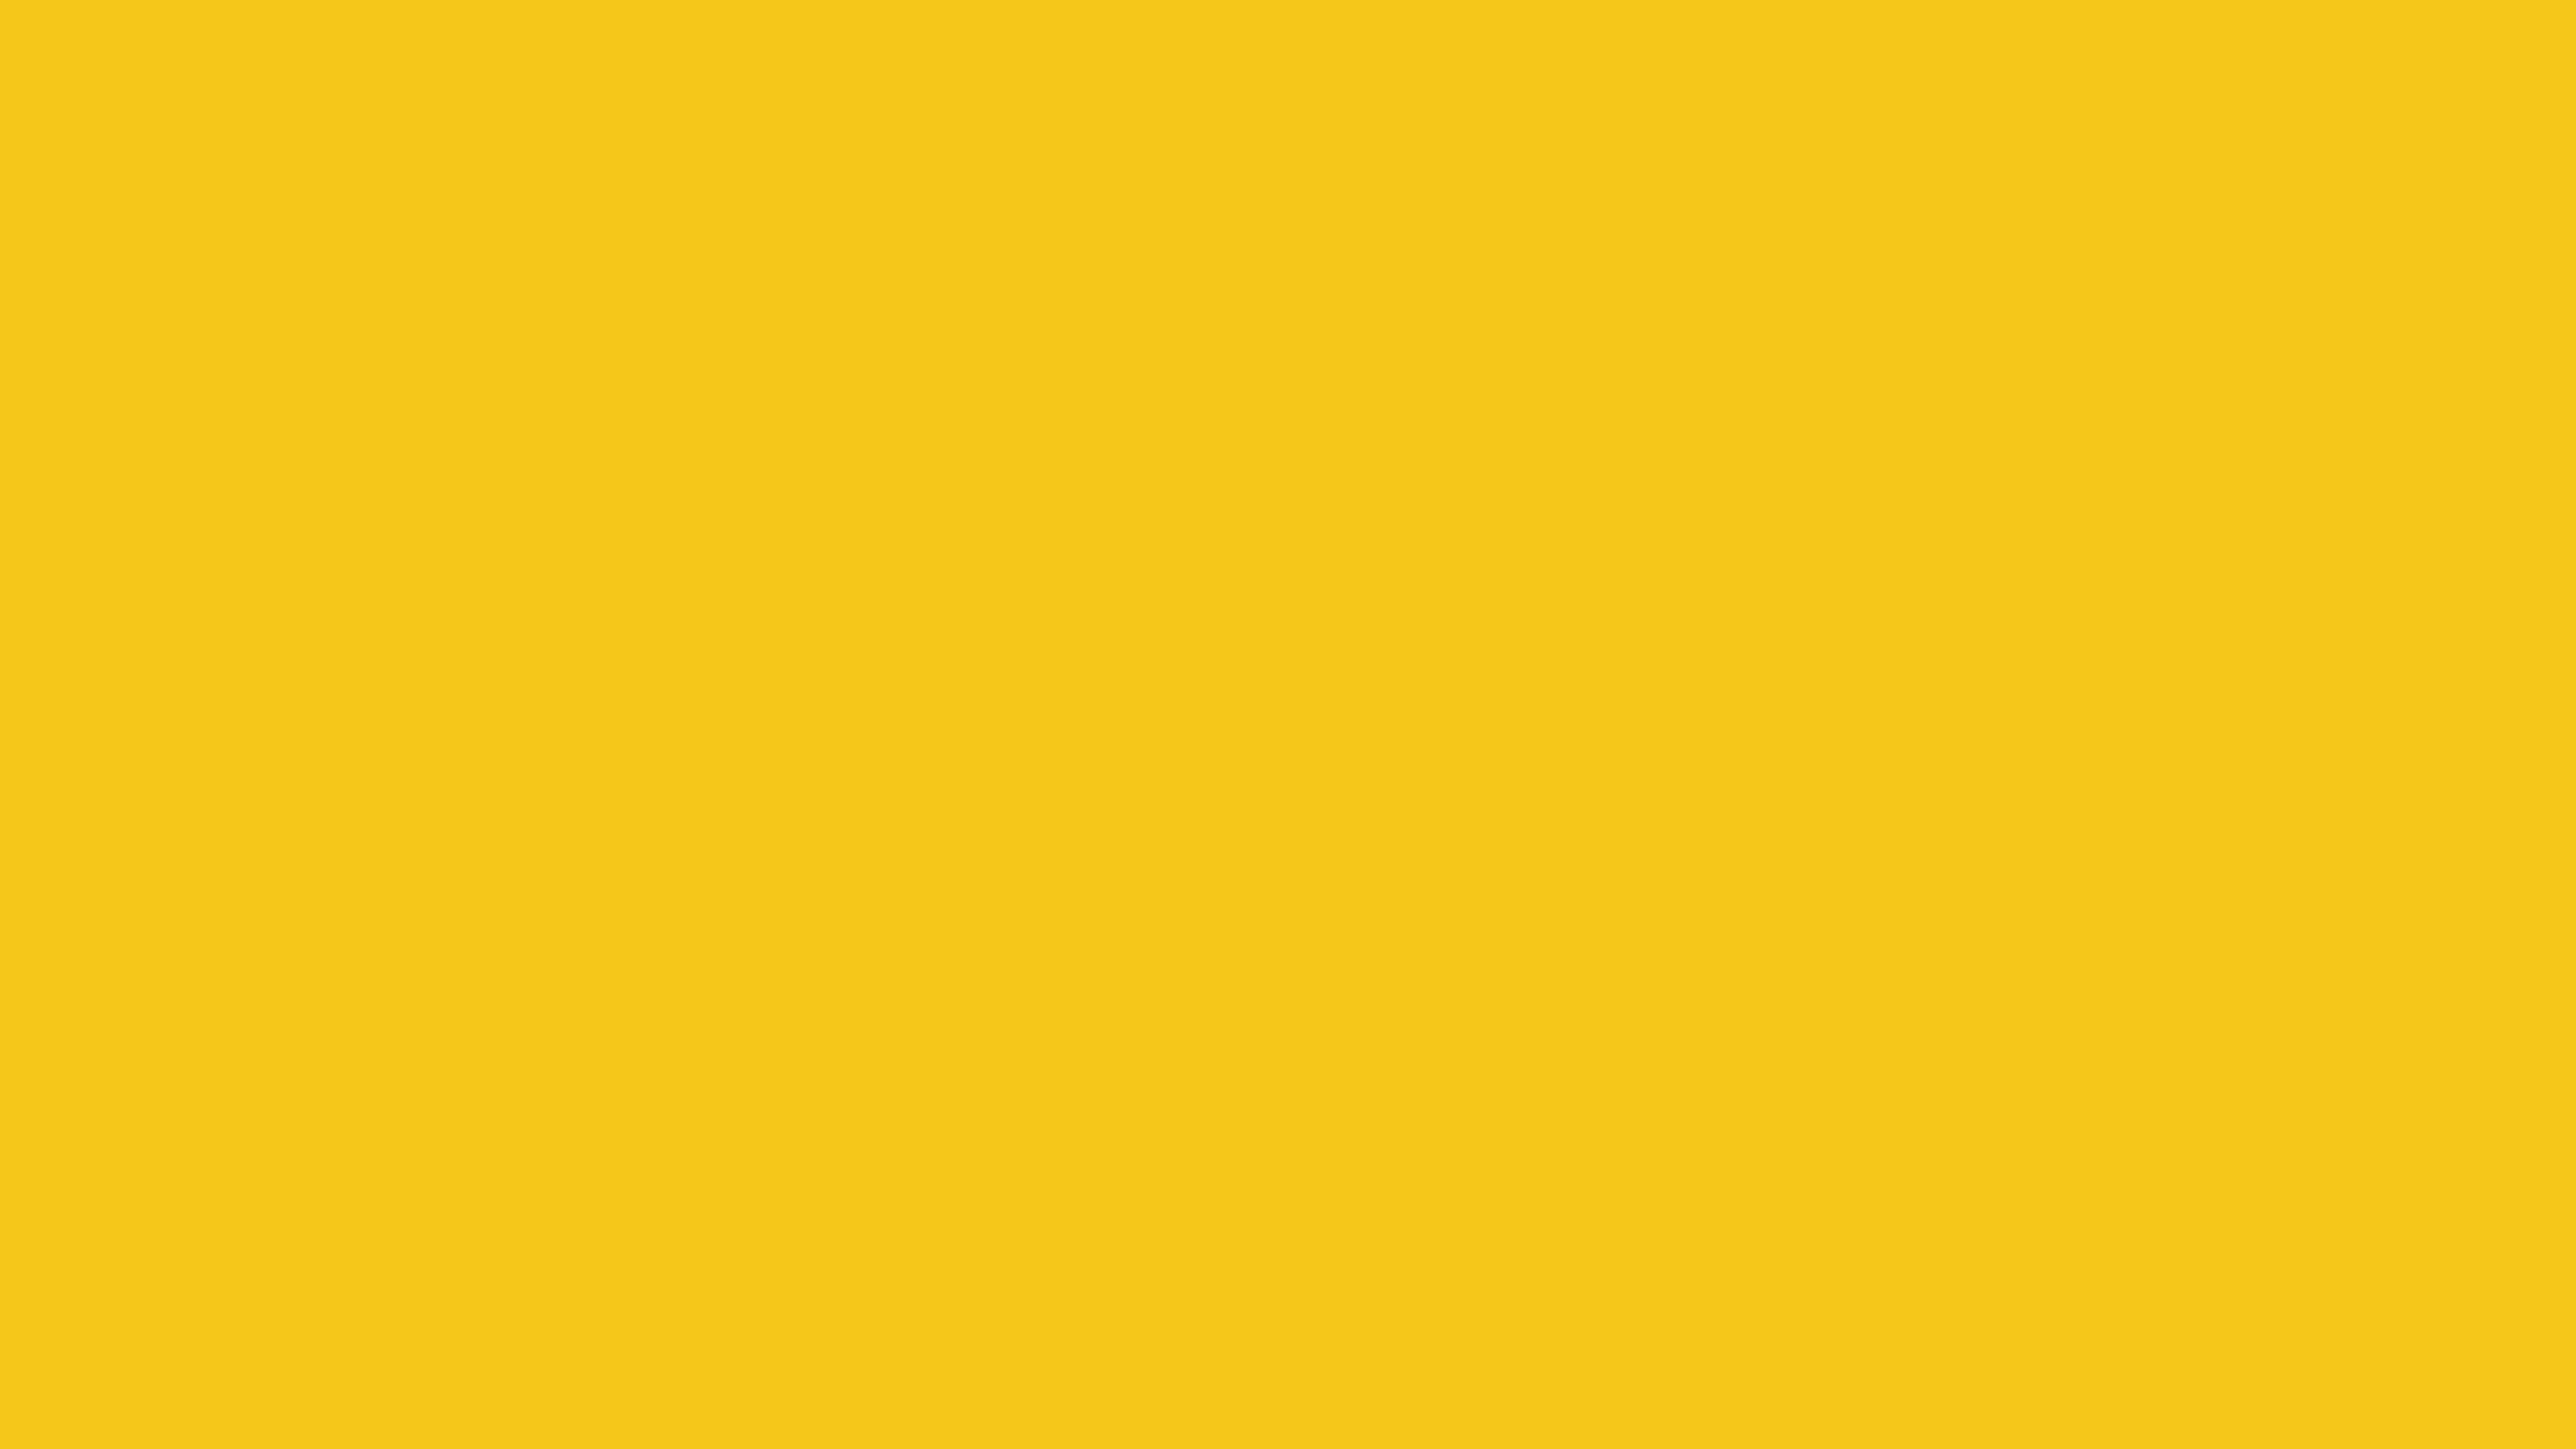 4096x2304 Deep Lemon Solid Color Background